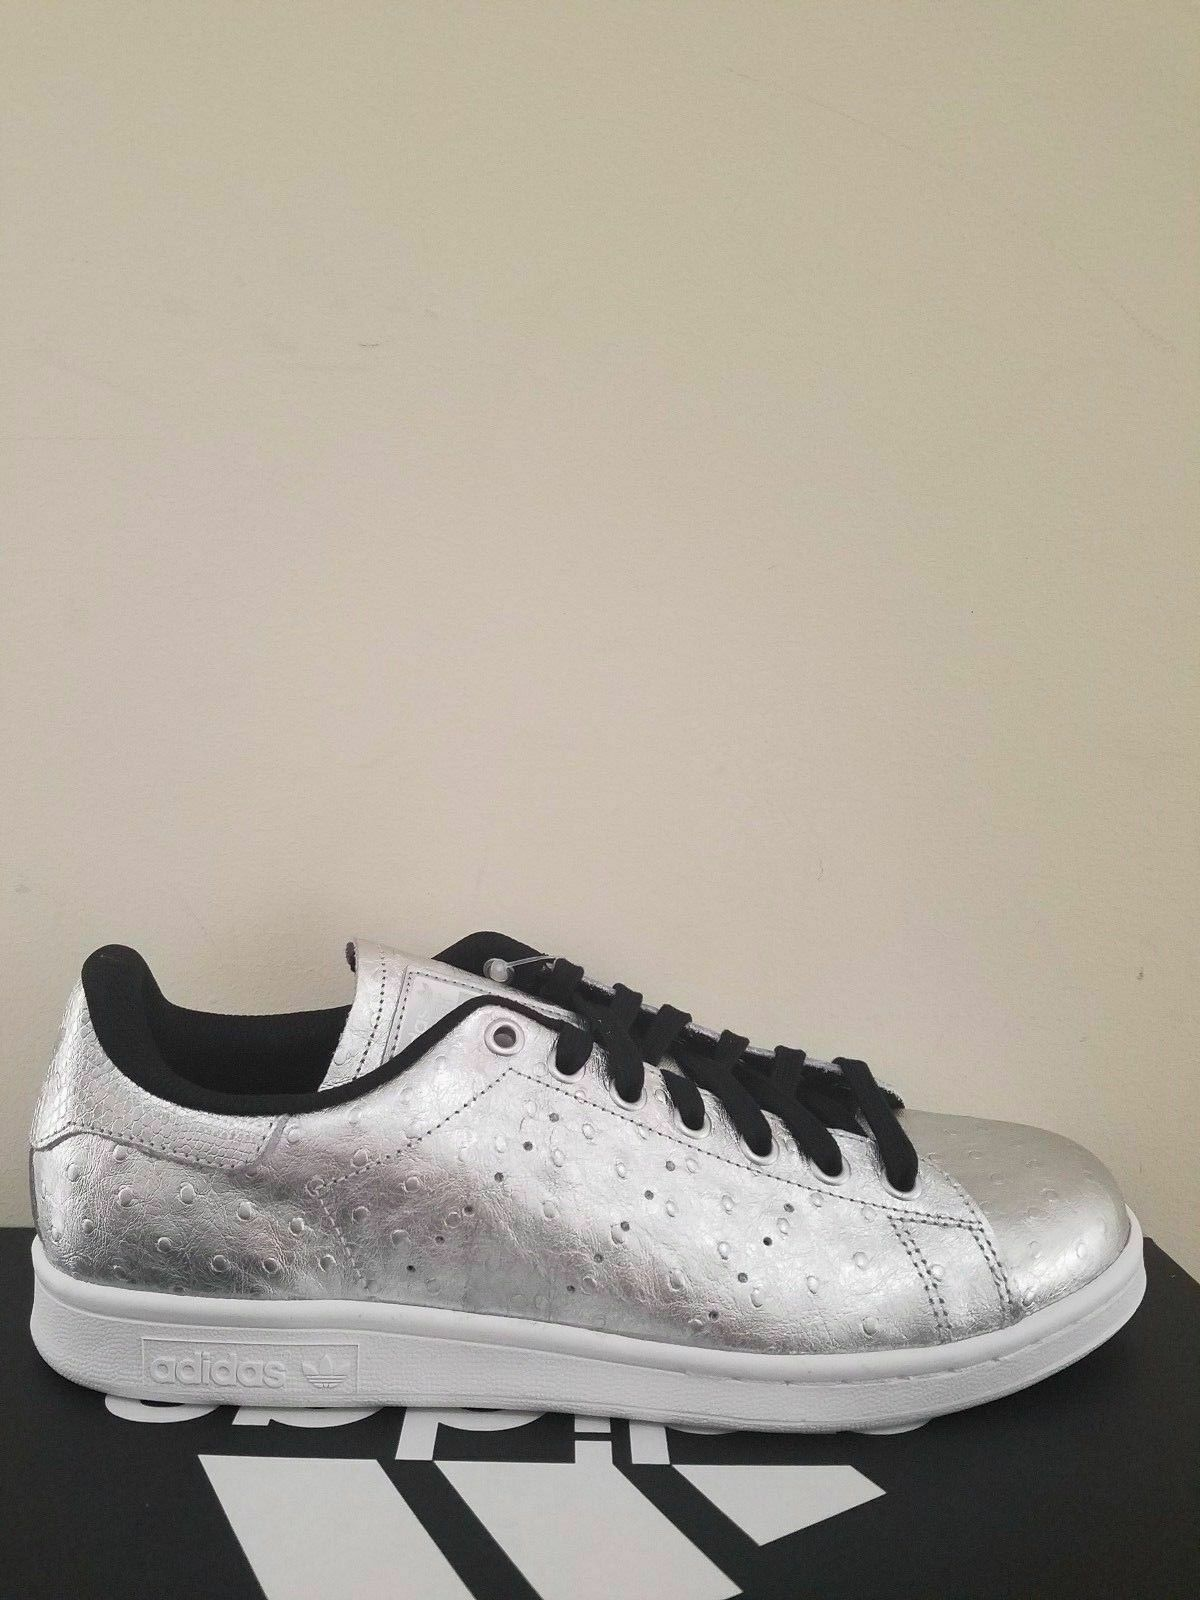 NIKE AIR FORCE 1 One Mid 07 Herren High Schuhe Weiss Sneaker Leder 315123 111